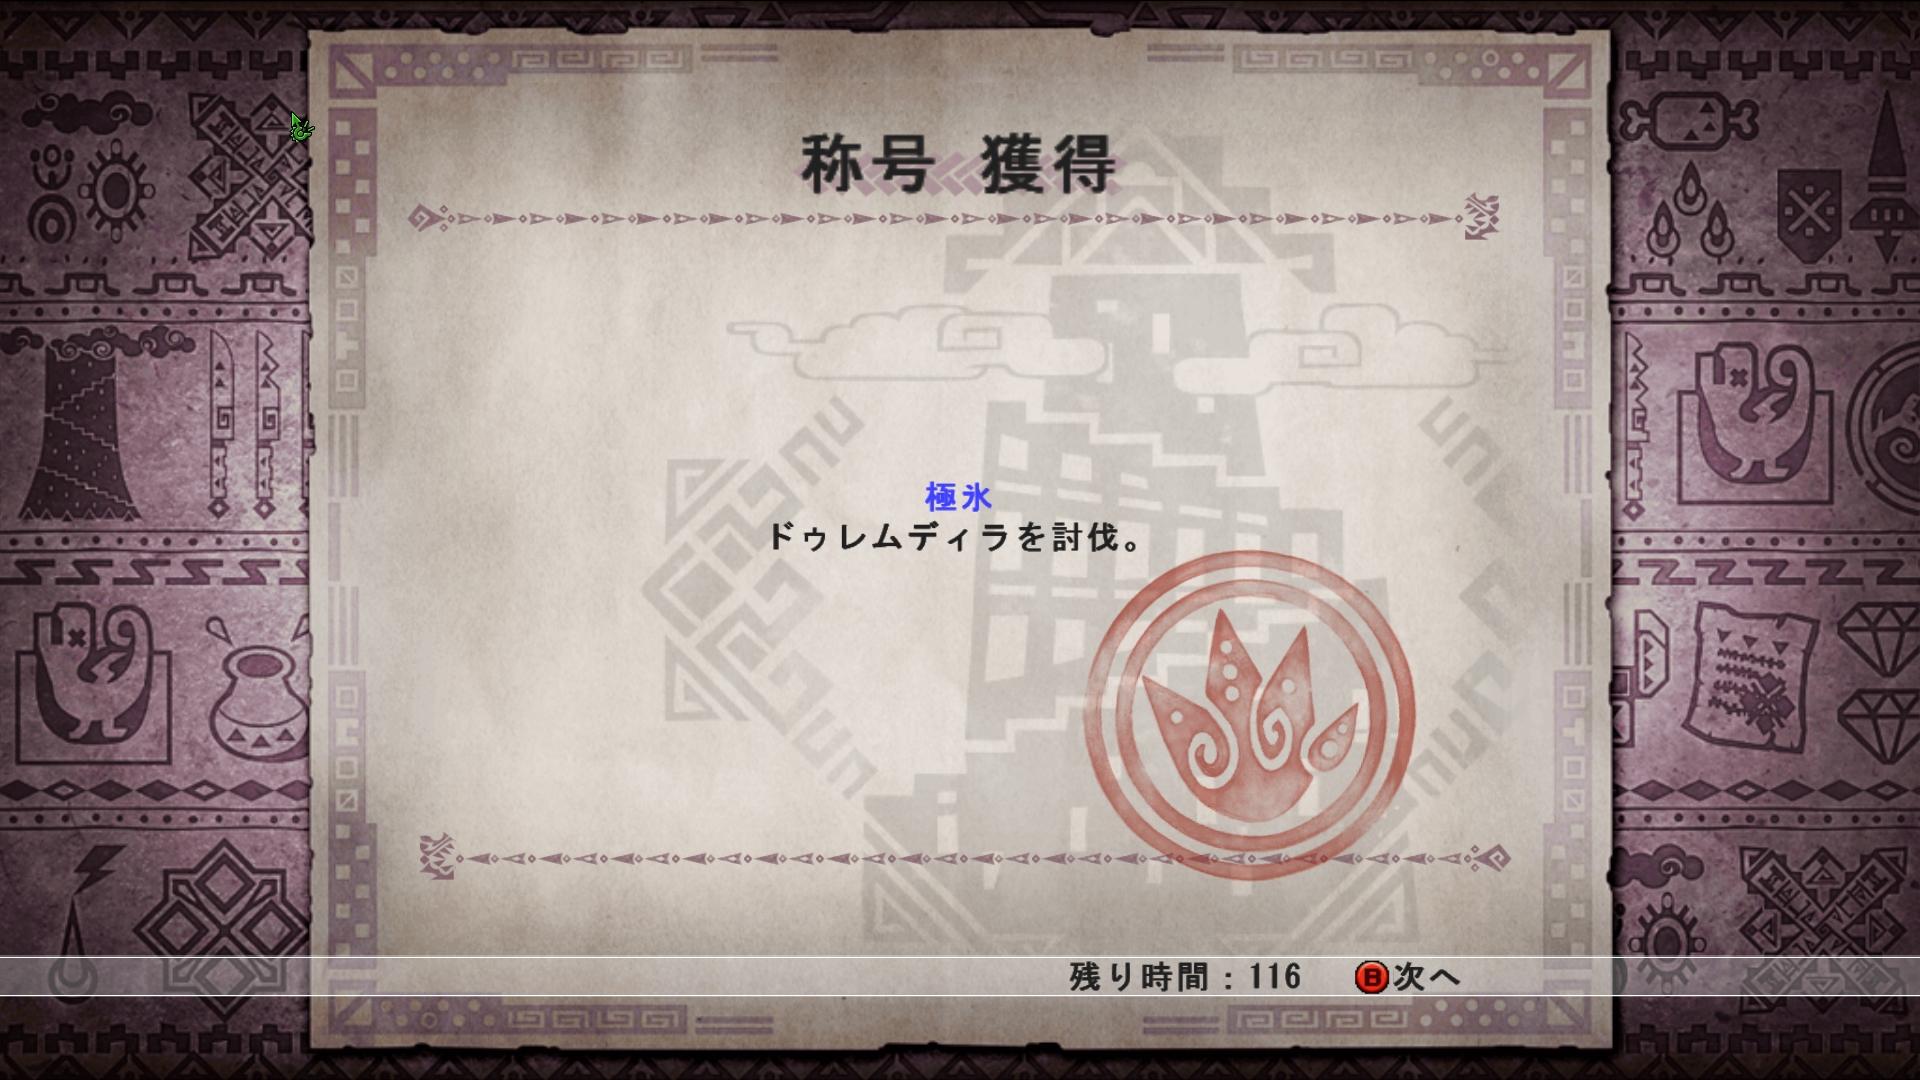 mhf_20150124_002114_354.jpg